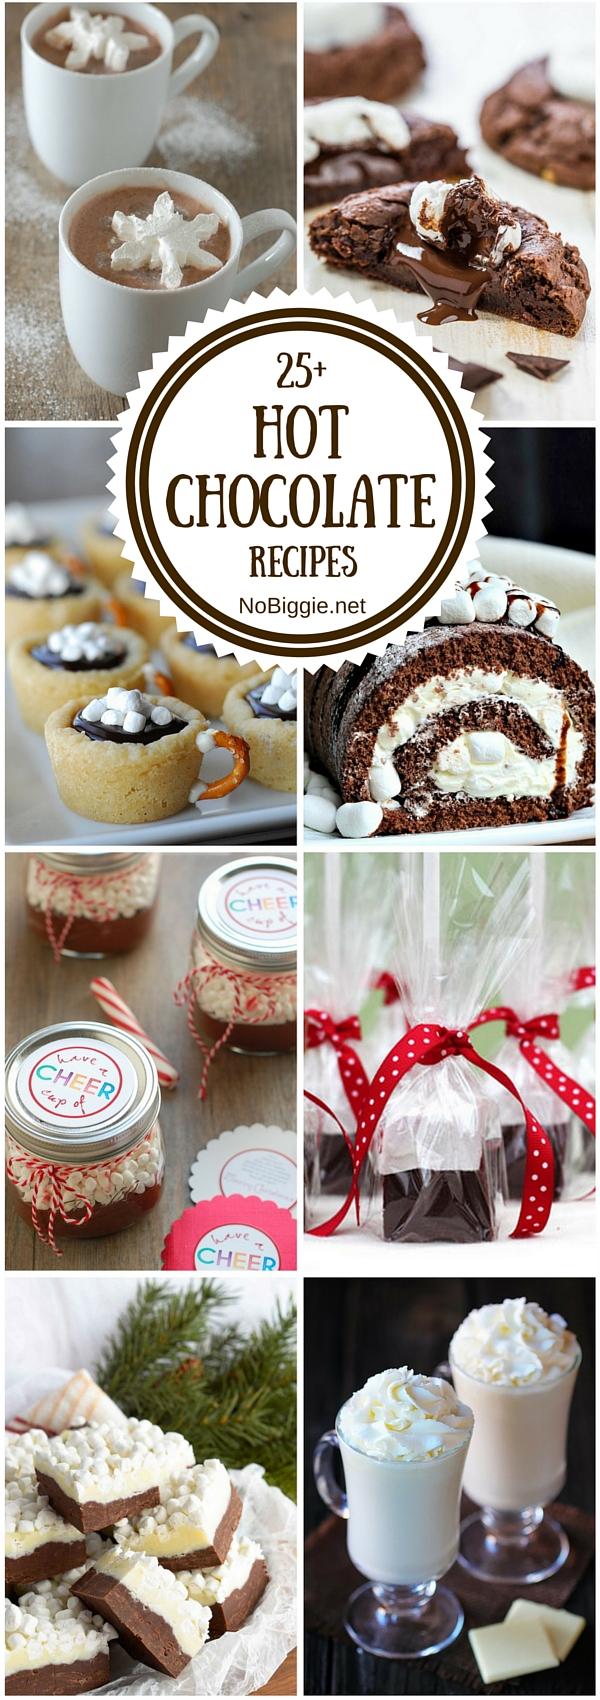 25+ hot chocolate recipes | NoBiggie.net